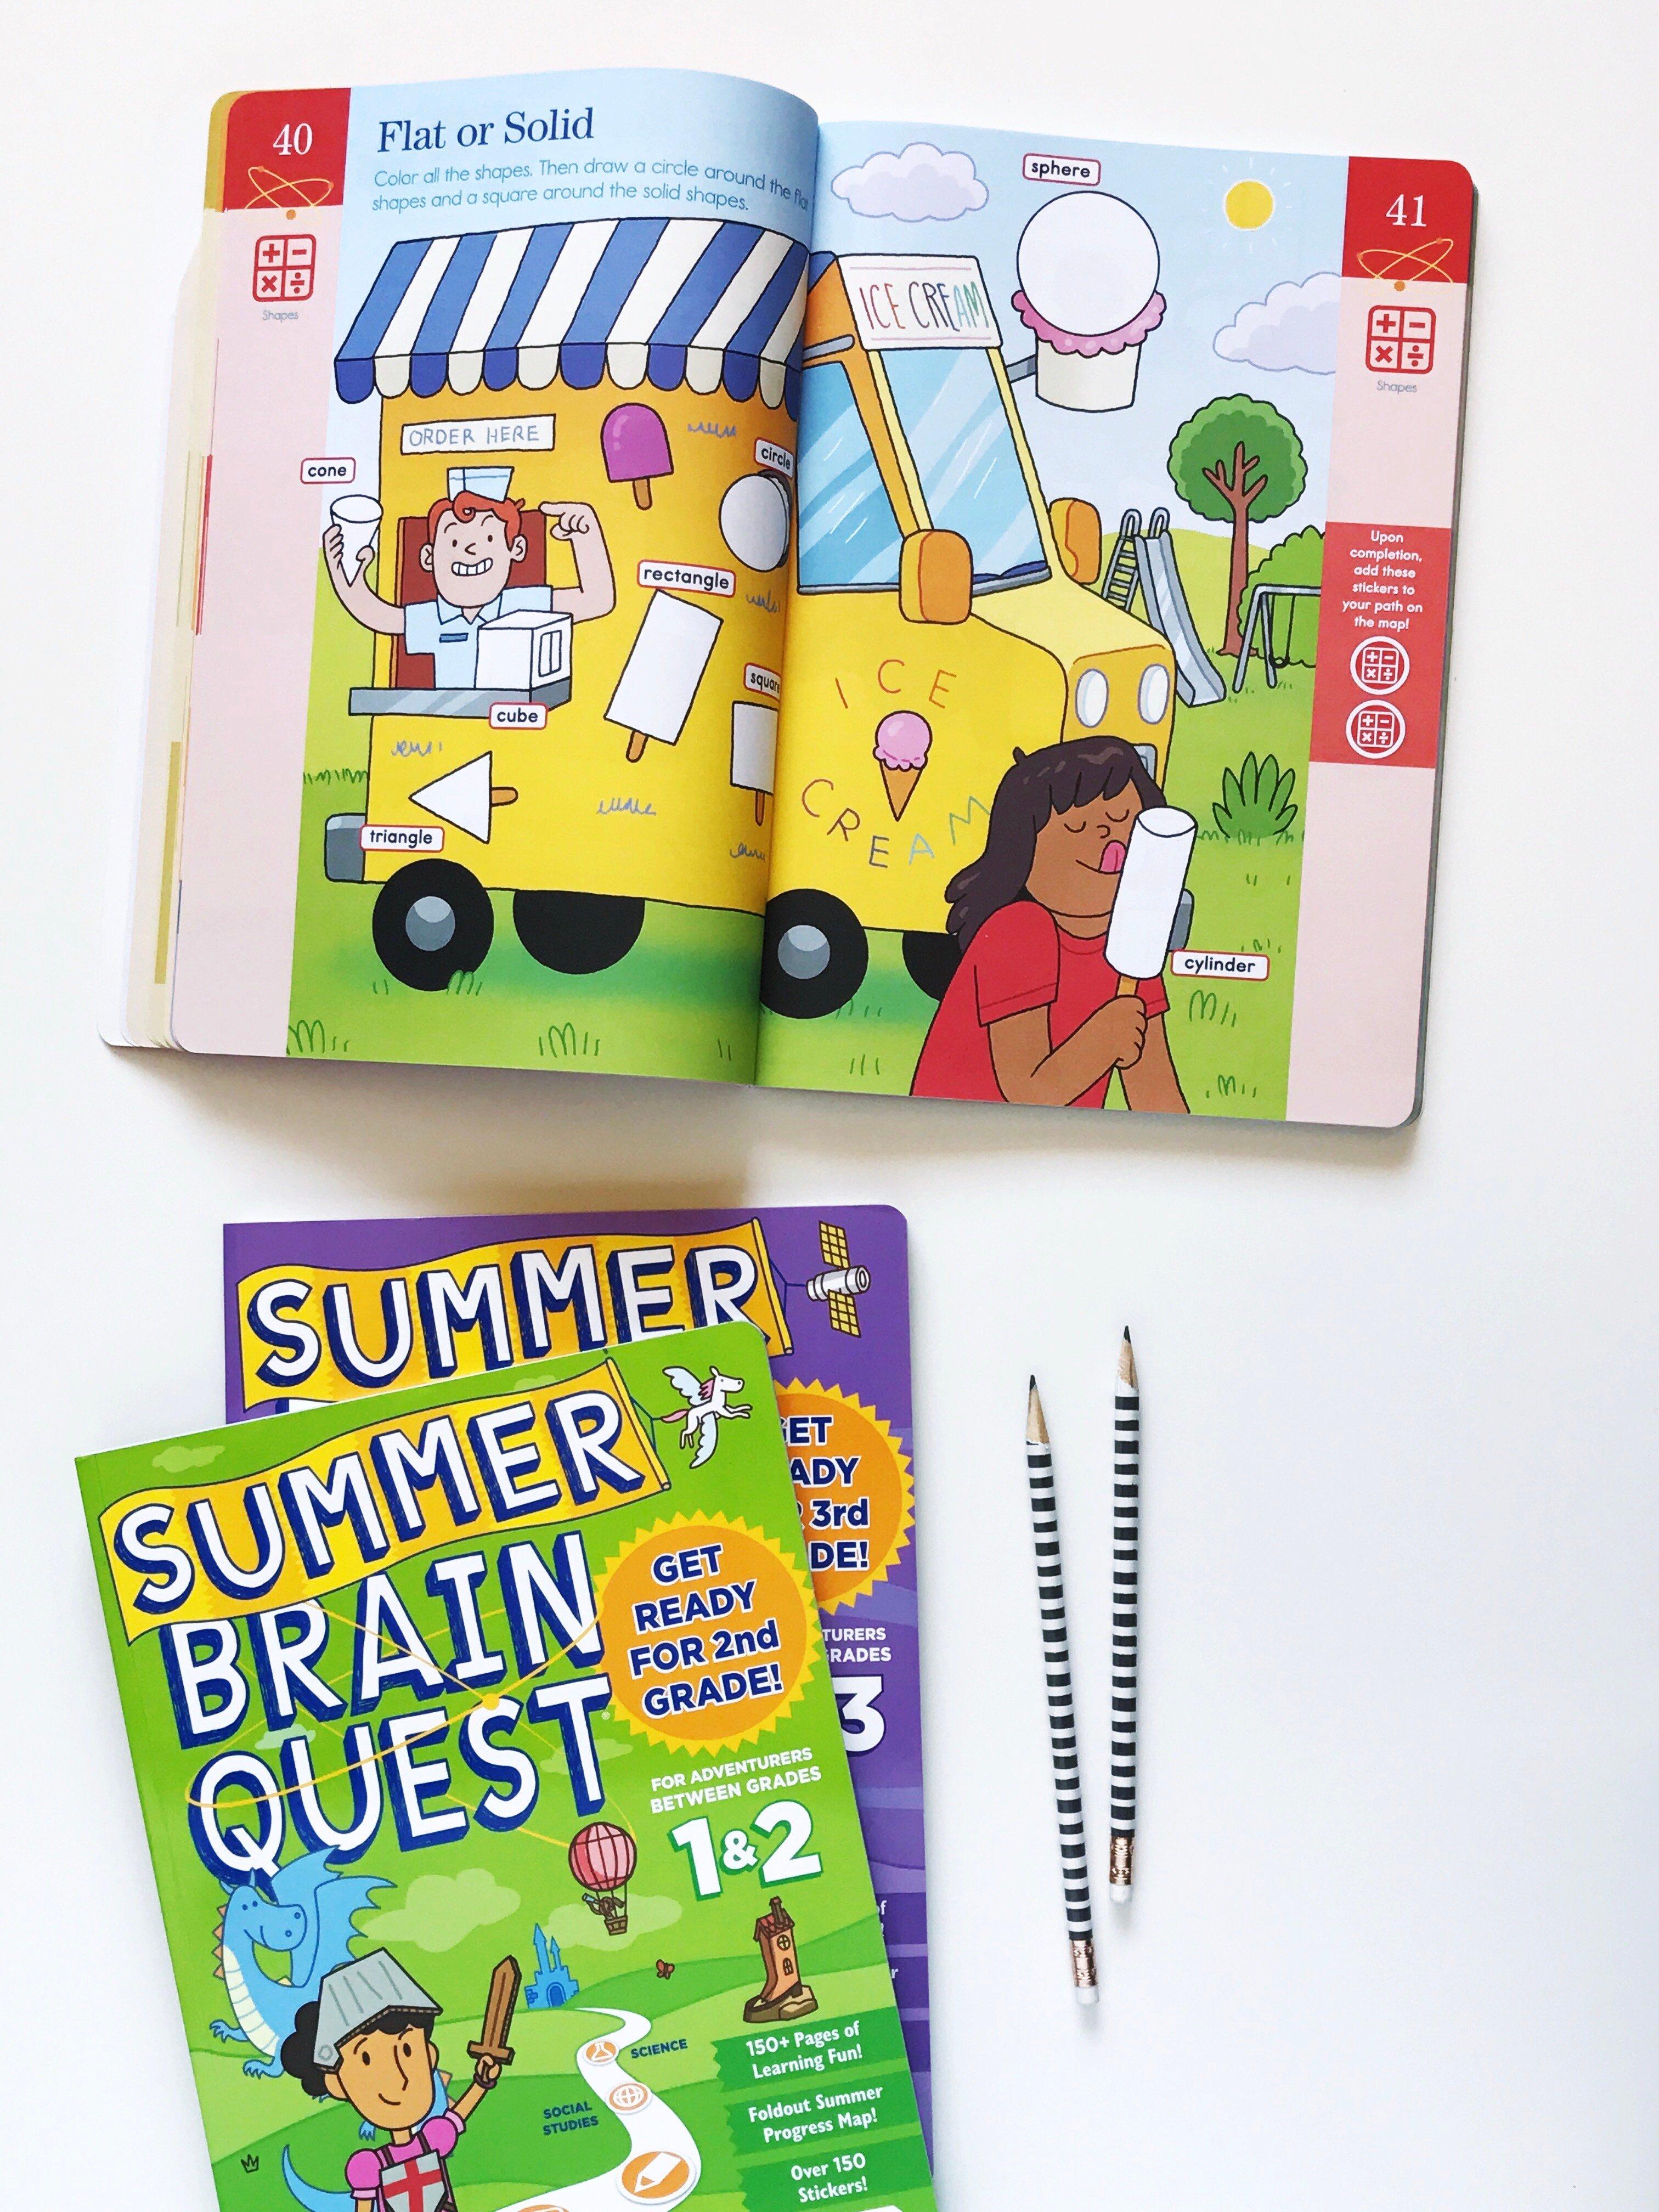 Summer Brain Quest Workbooks to keep kids #SummerSmart via @PagingSupermom